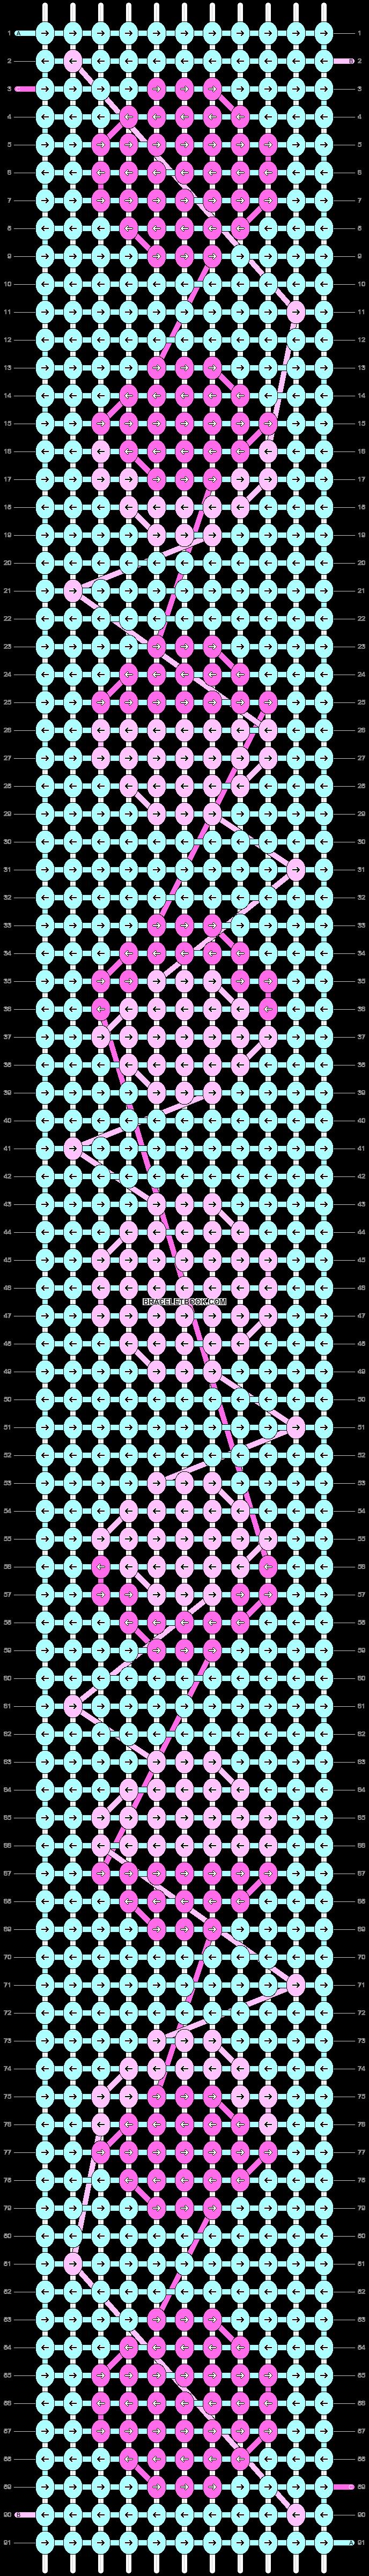 Alpha pattern #26521 variation #20077 pattern